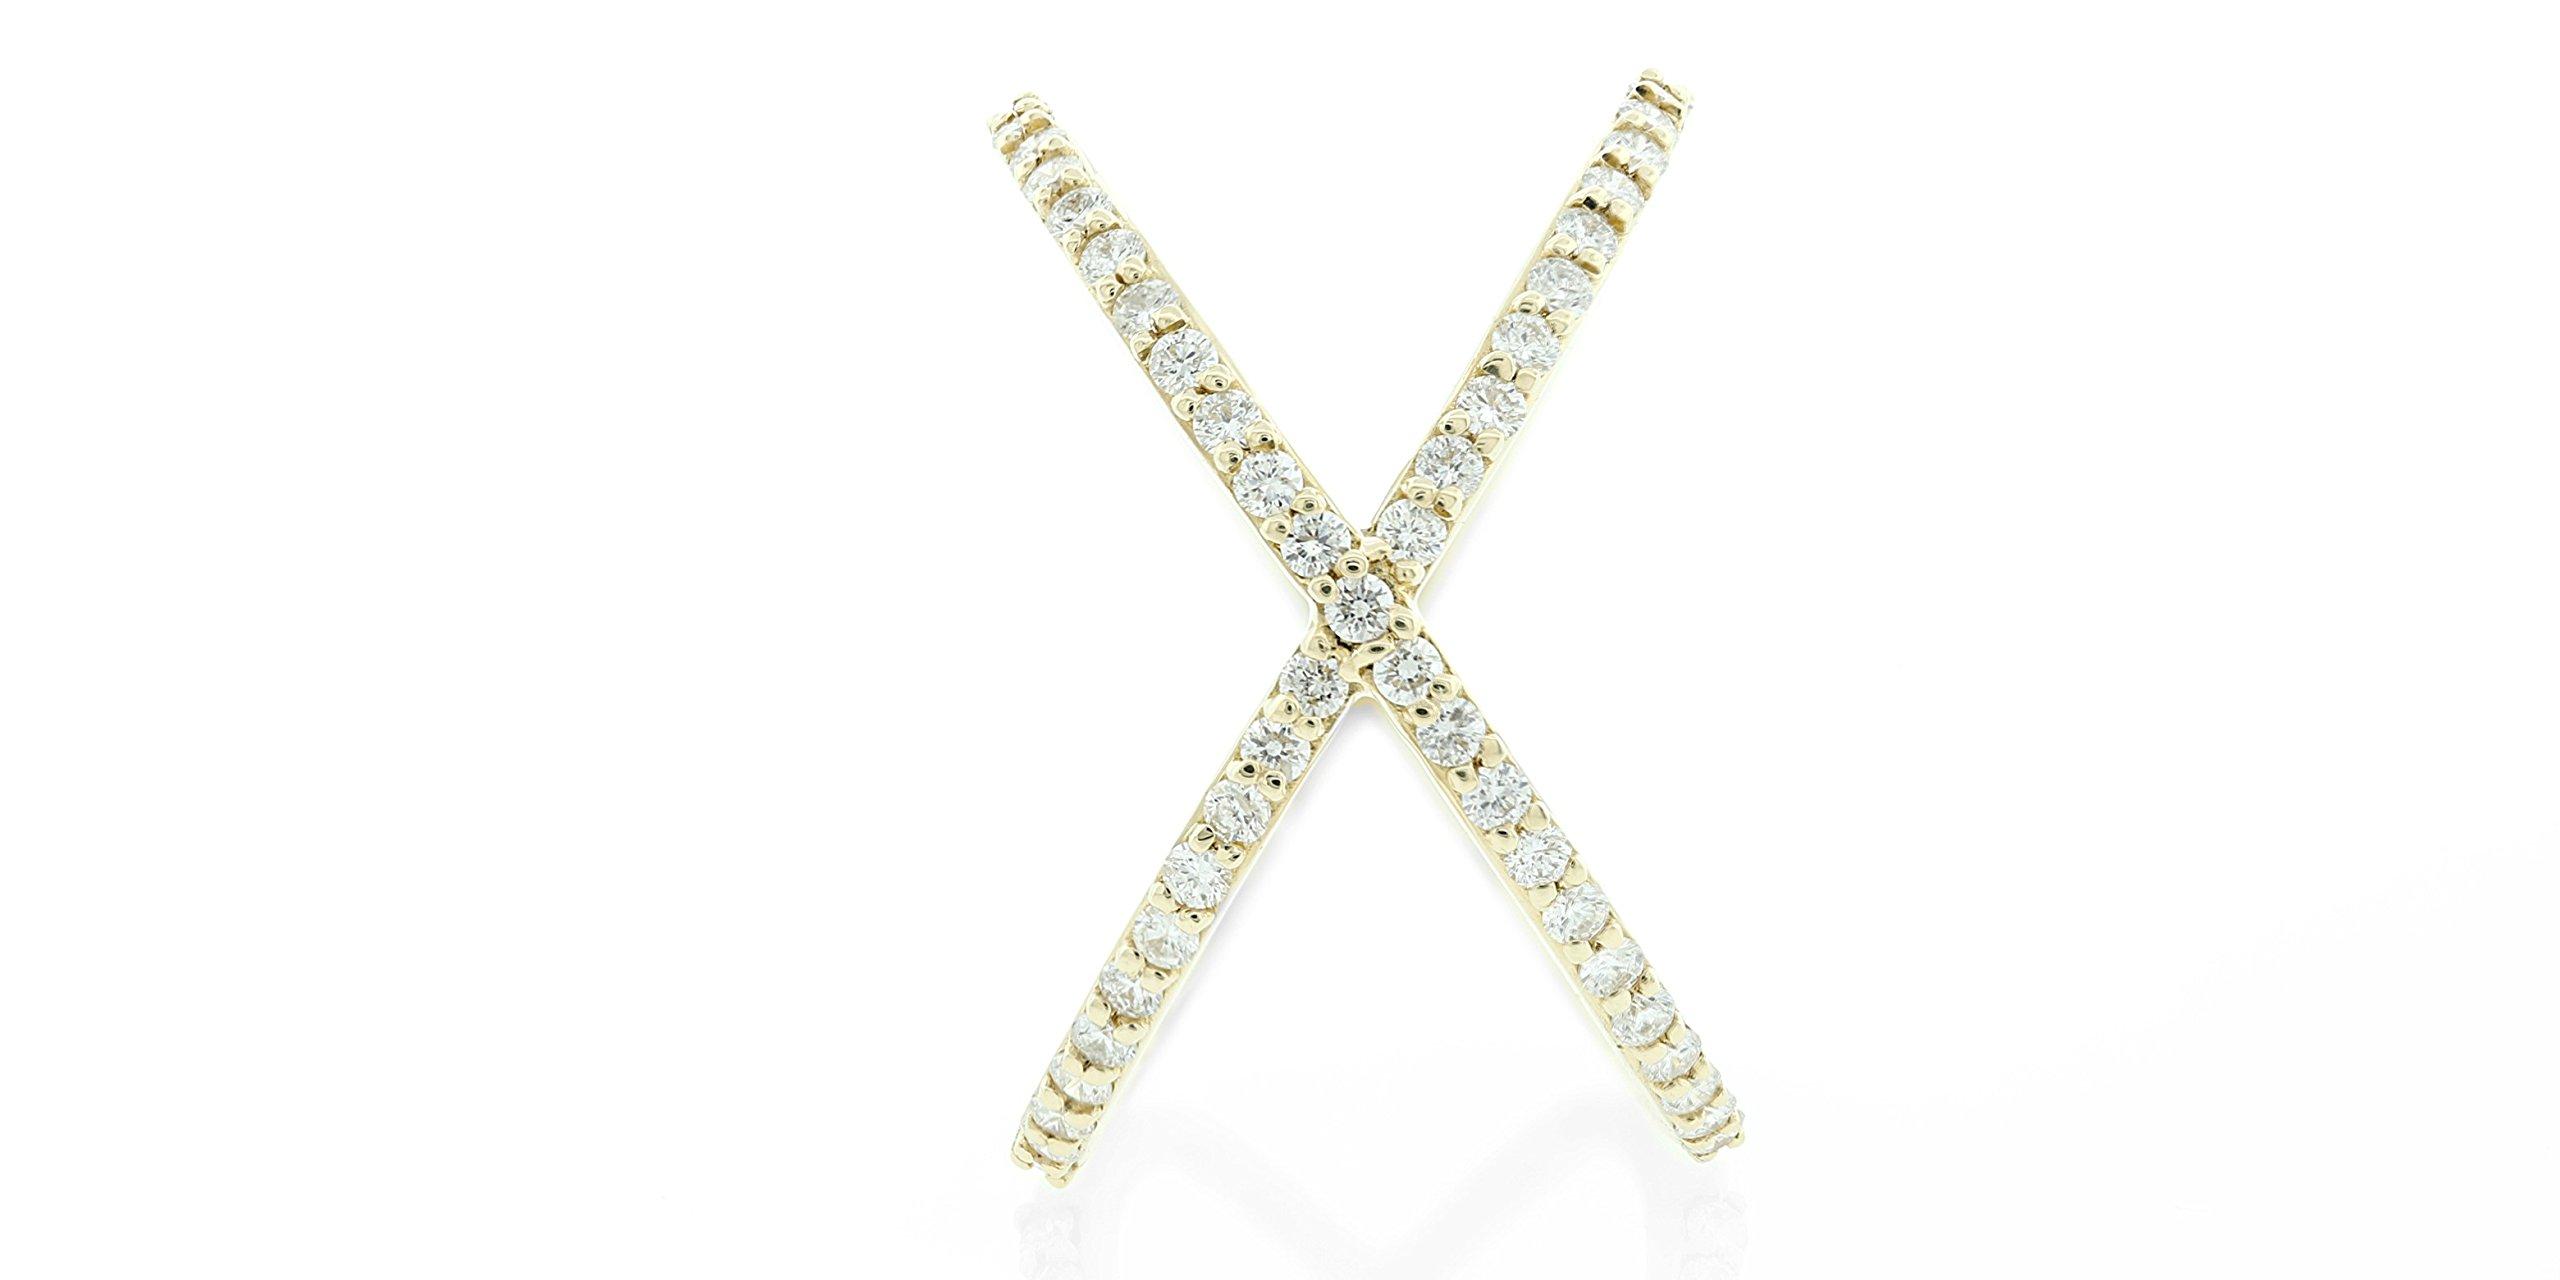 London Fine Jewelry Round Diamond Criss-Cross Orbit Ring in 14k Yellow Gold